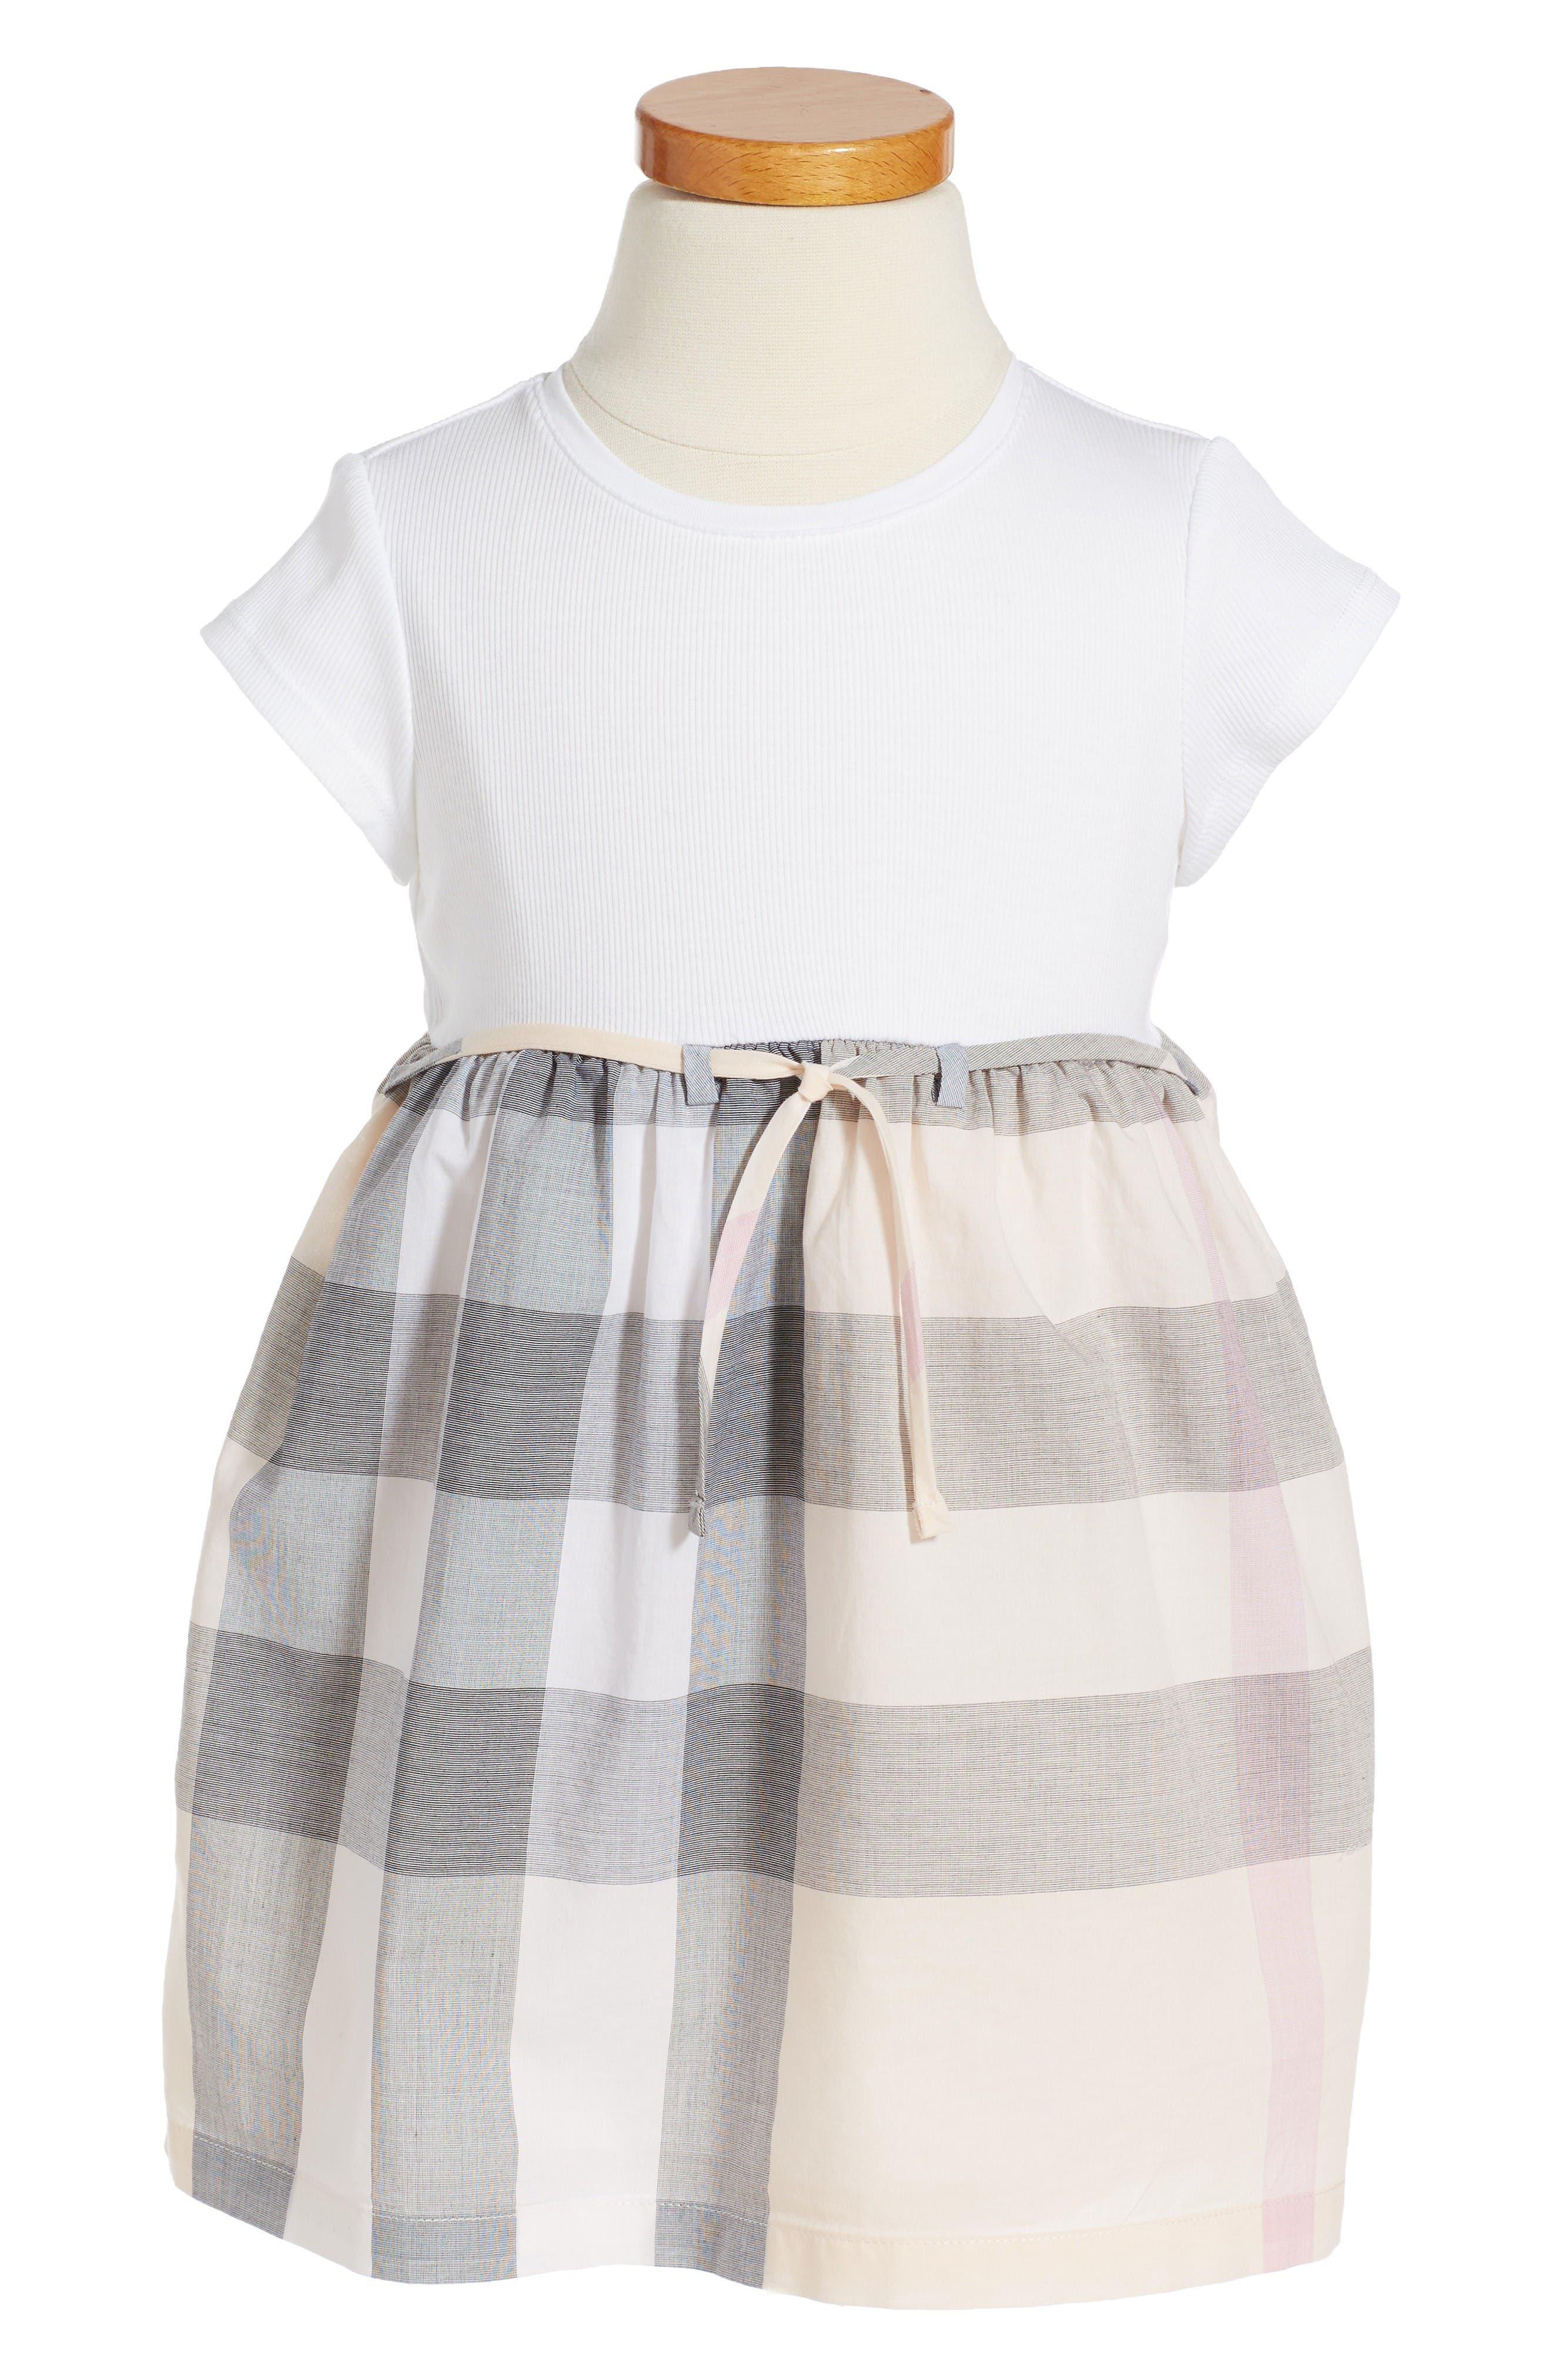 Burberry Mini Rosey Check Dress Baby Girls & Toddler